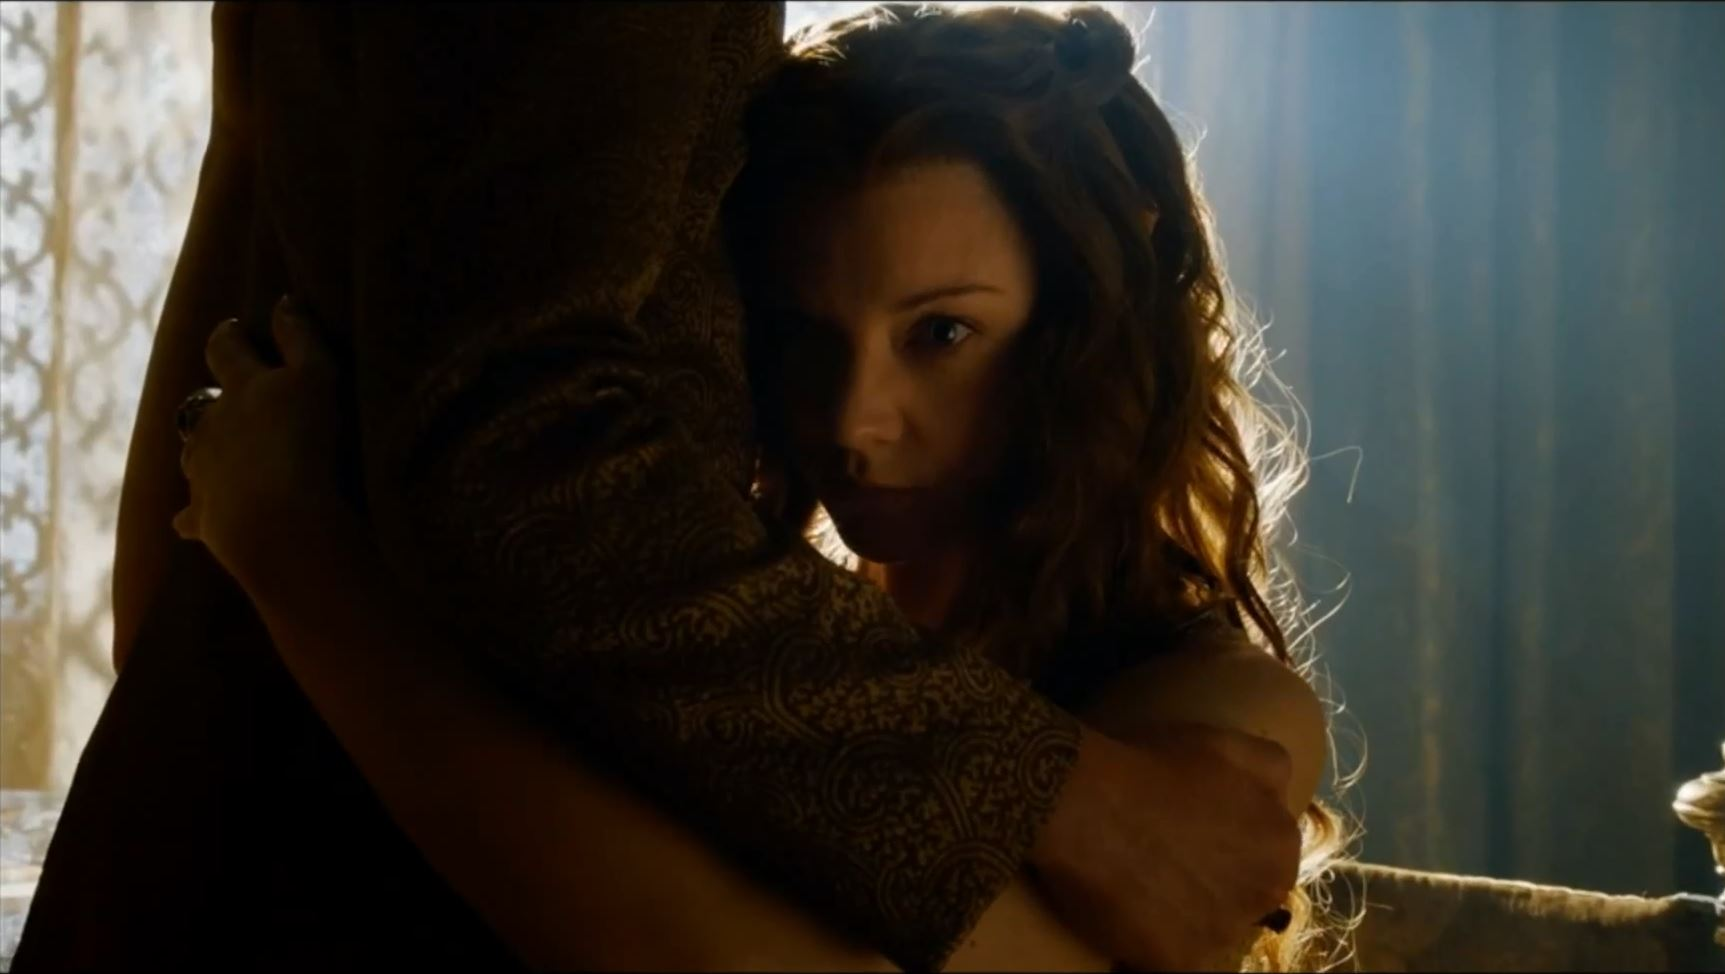 Game of Thrones Season 5 Trailer 2. Natalie Dormer as Lady Margaery Tyrell